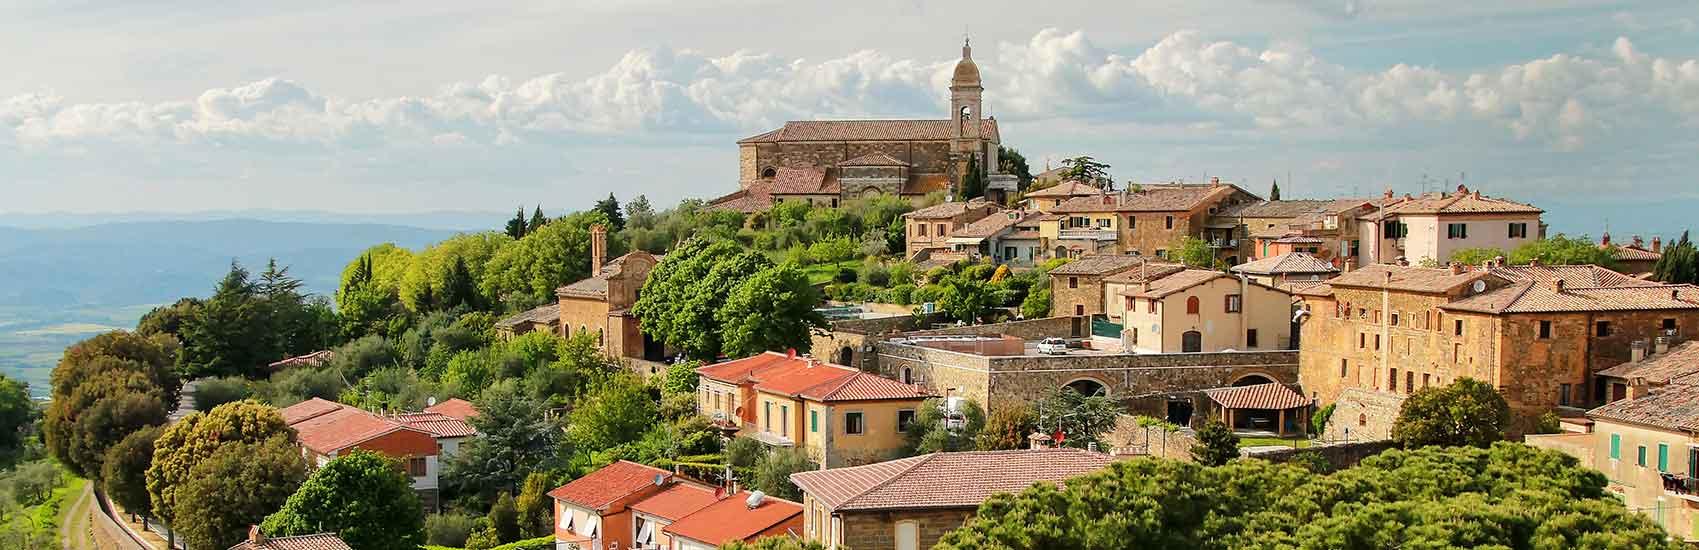 Montalcino Culinary Week 0